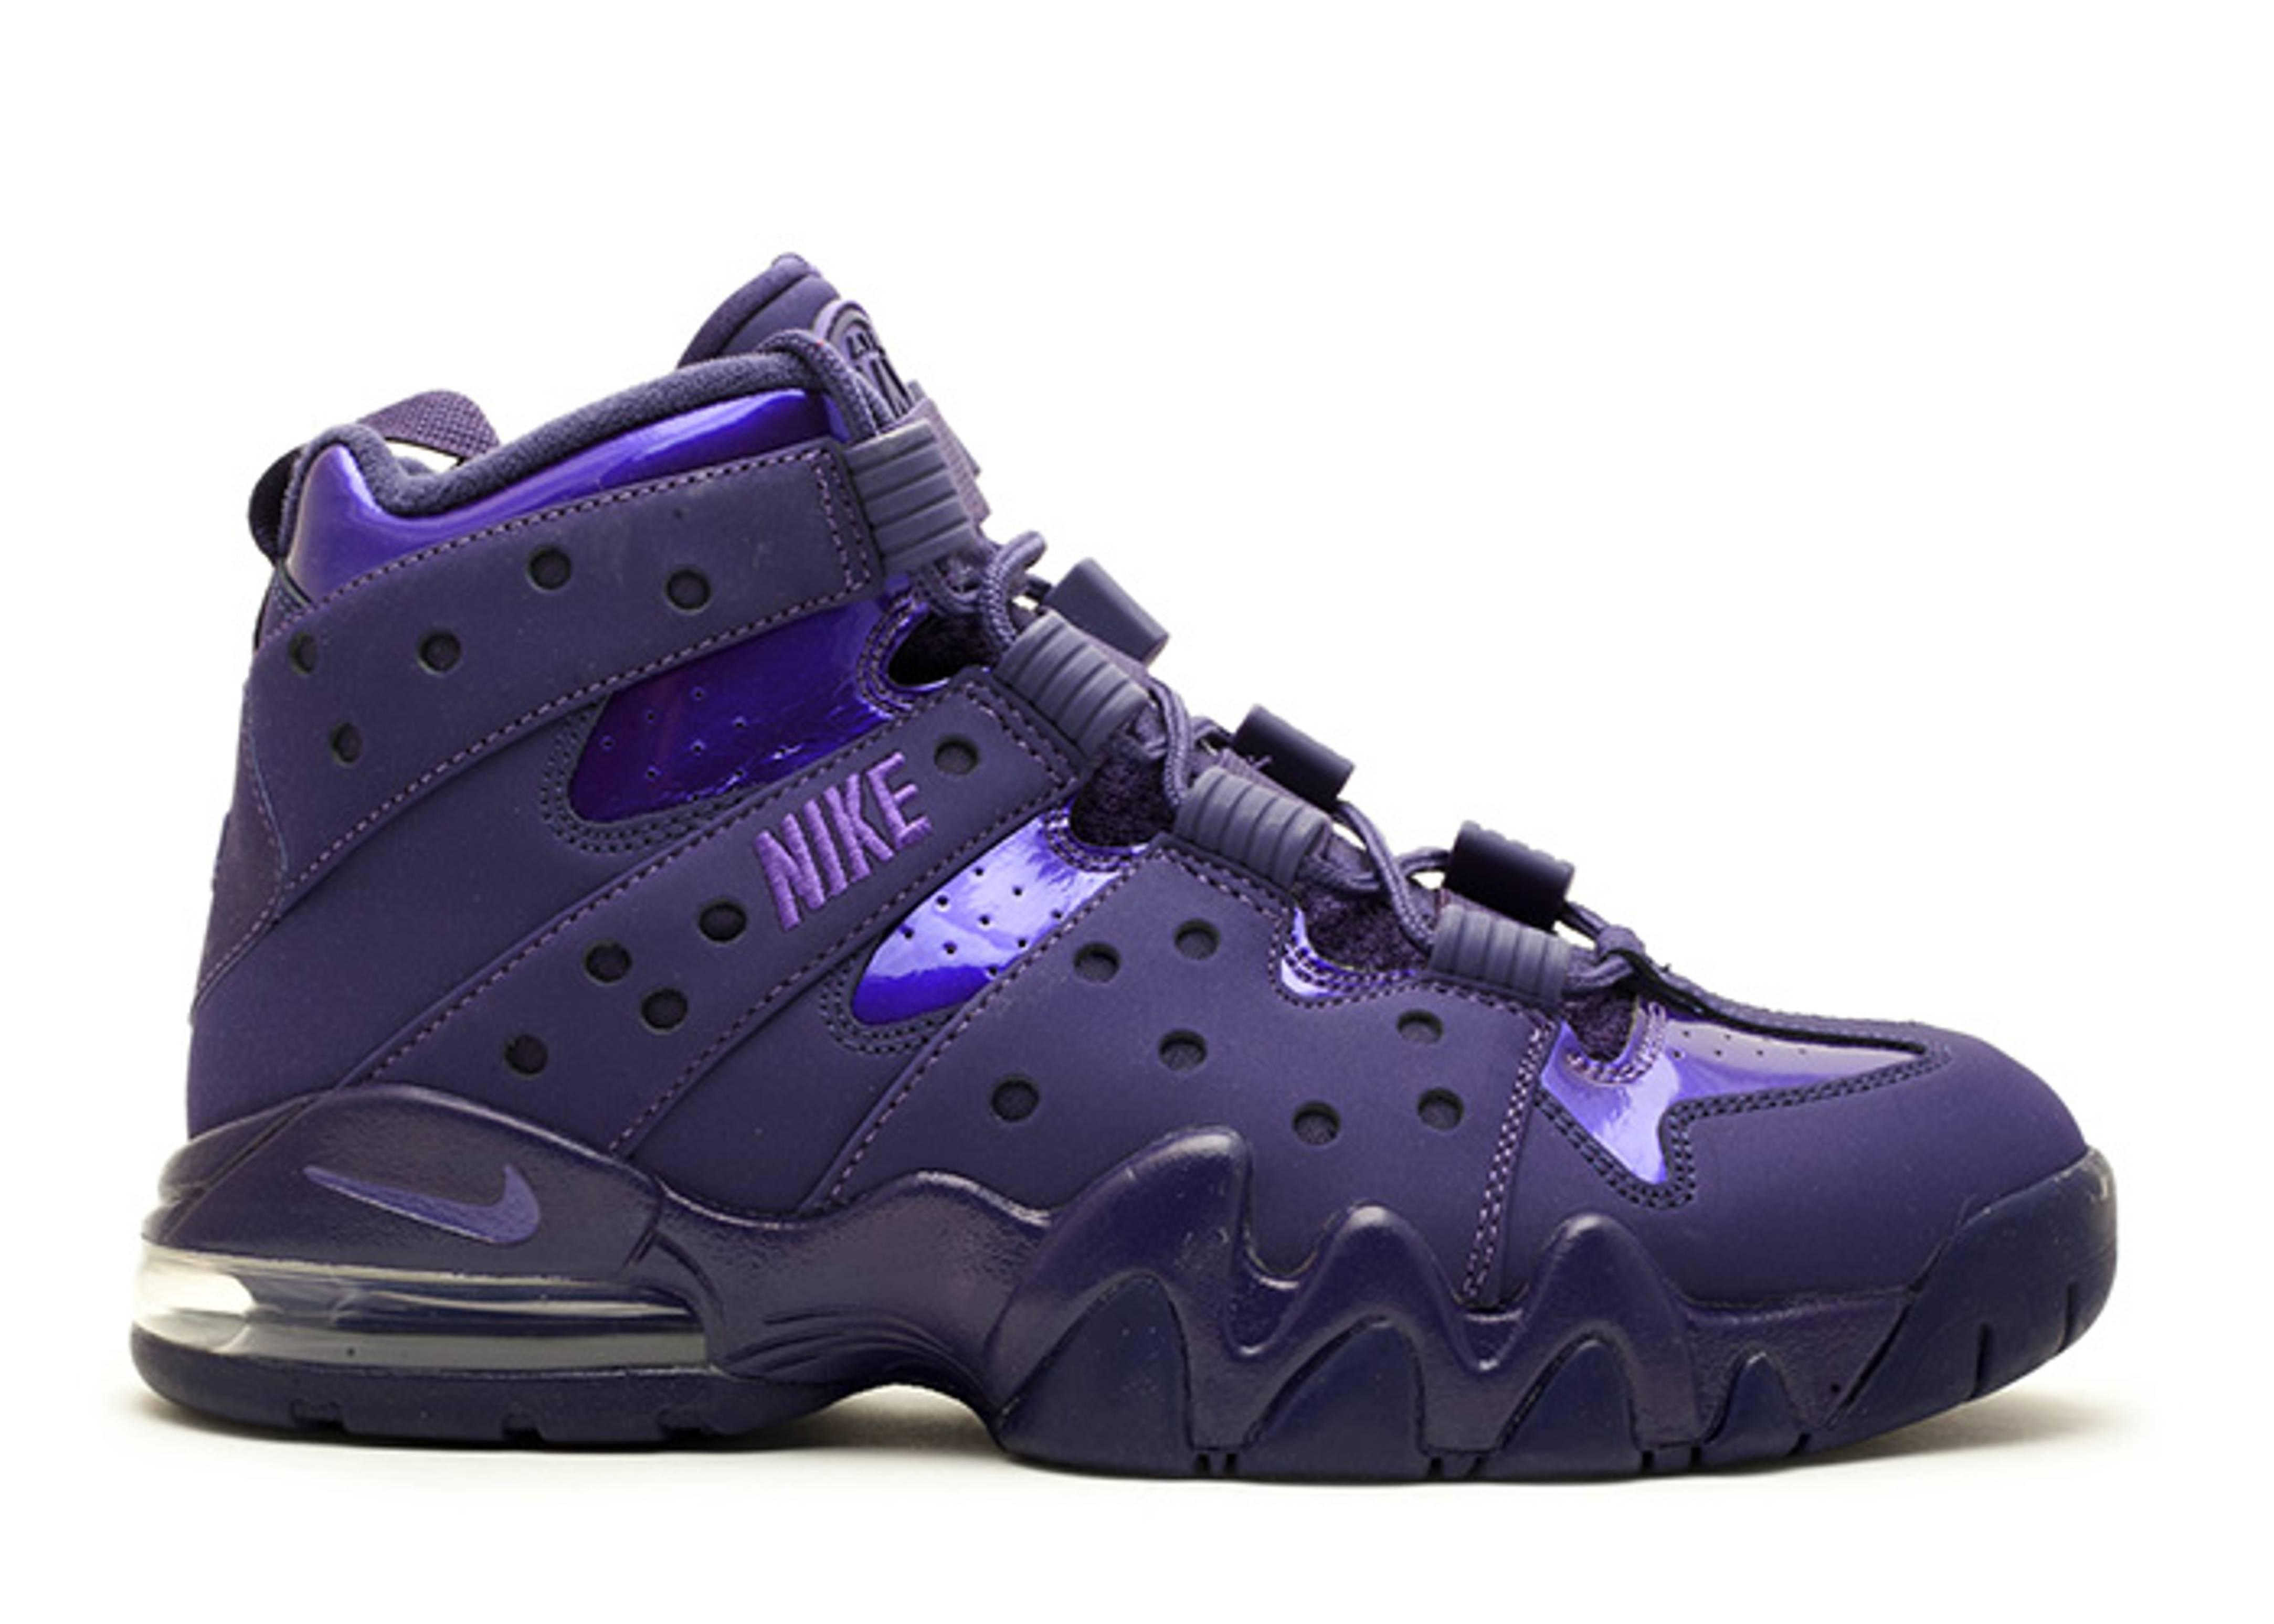 Nike Air Max2 Cb 94 Personnes Violet Encre / Varsity